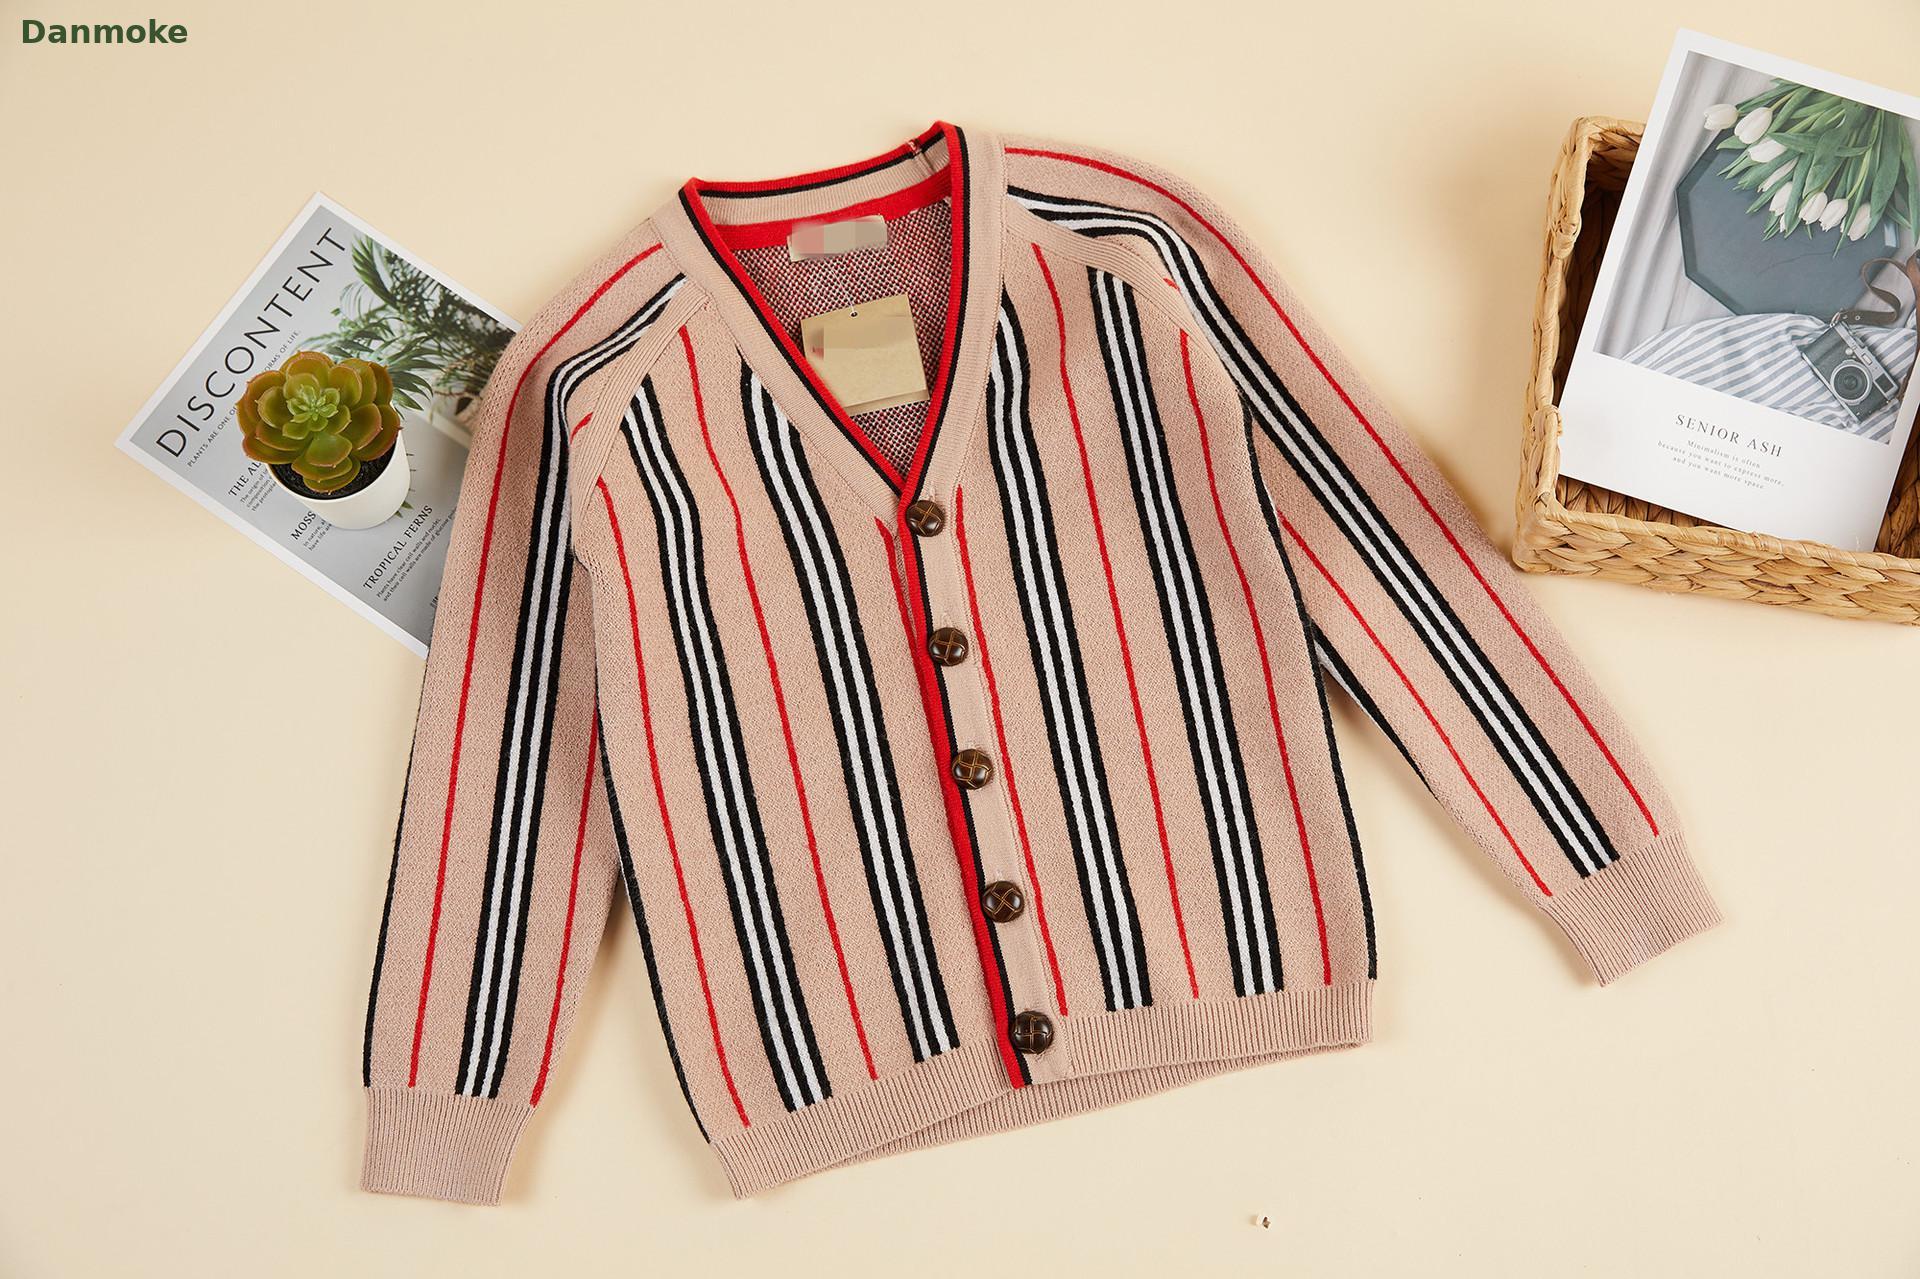 Danmoke Cashmere Boys And Girls Sweaters Tops Striped Kids Cardigan Jackets Anutumn Winter 3-8y